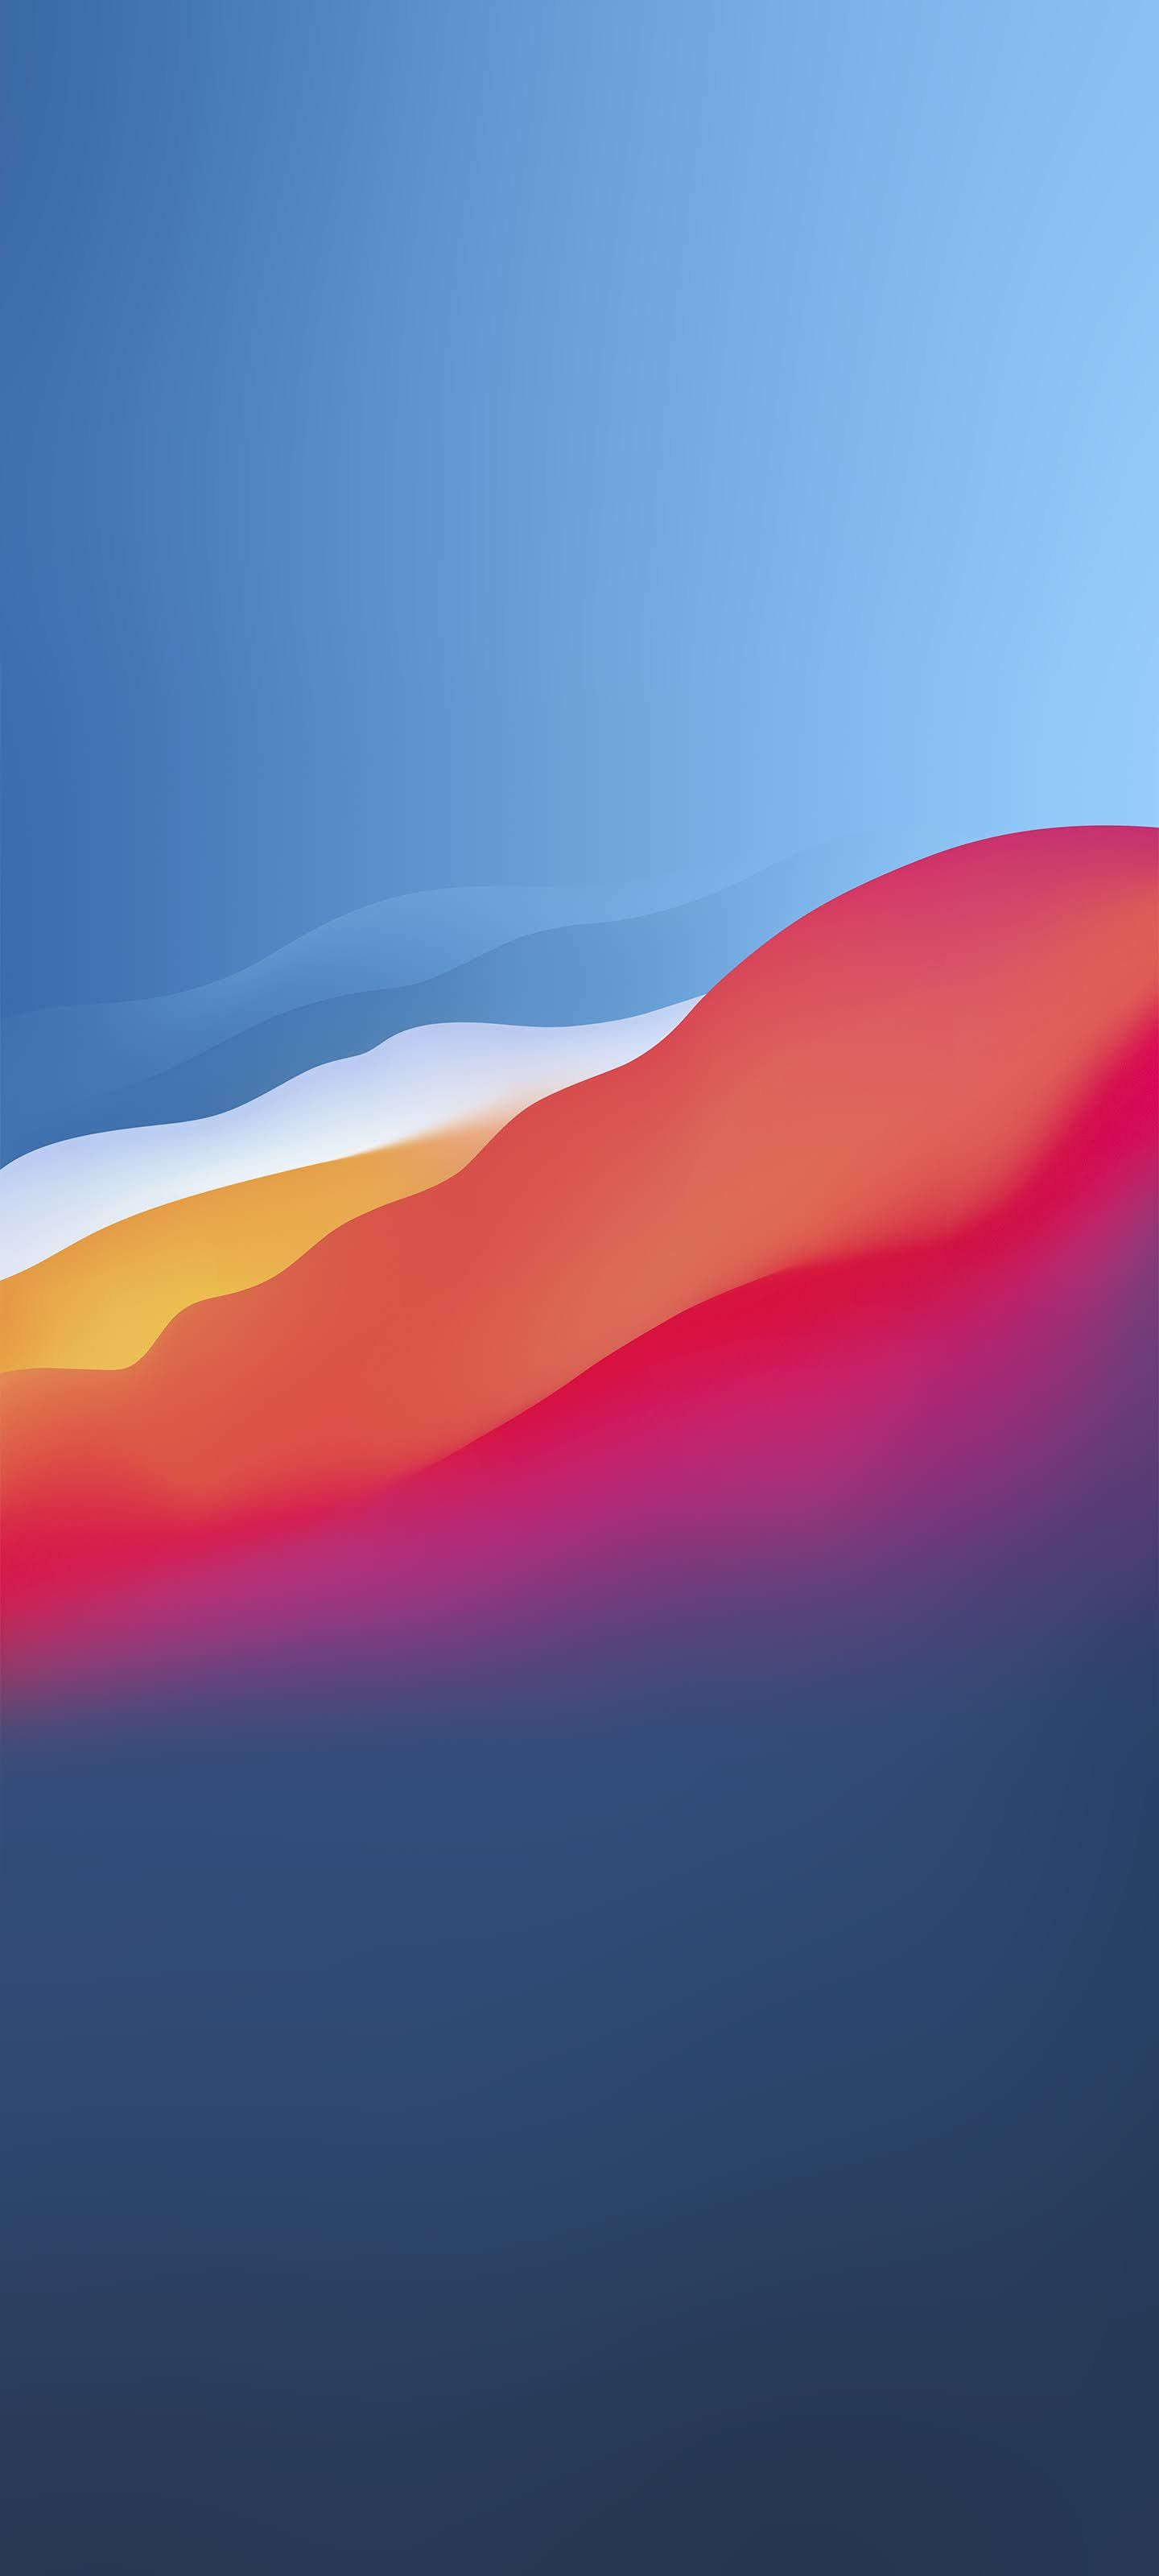 Macos Big Sur Wallpaper In 2020 Oneplus Wallpapers Abstract Iphone Wallpaper Xiaomi Wallpapers